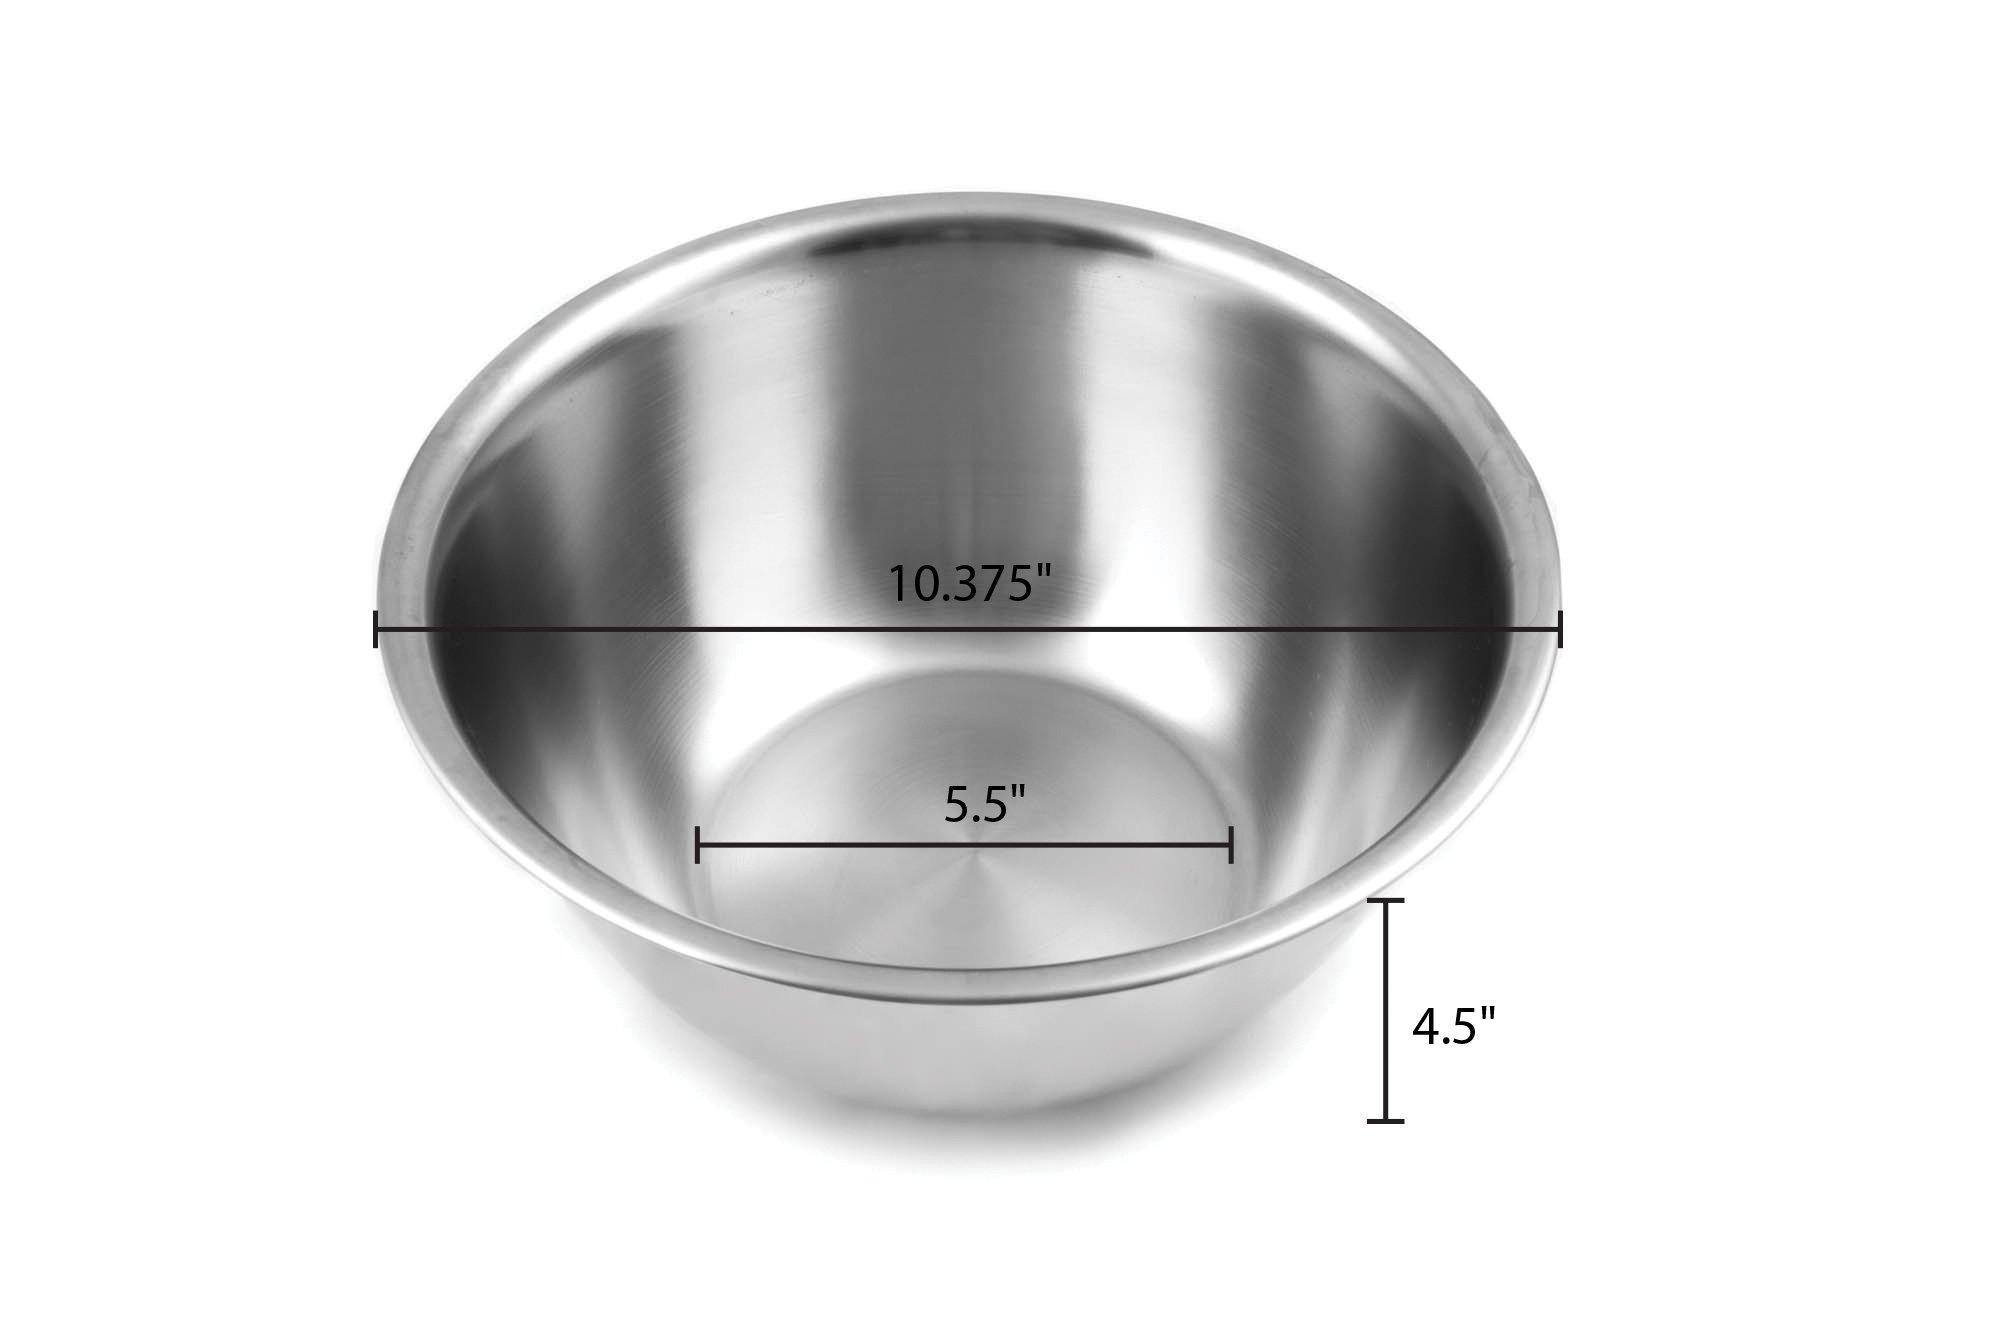 Fox Run 5-Quart Stainless Steel Mixing Bowl by Fox Run (Image #2)